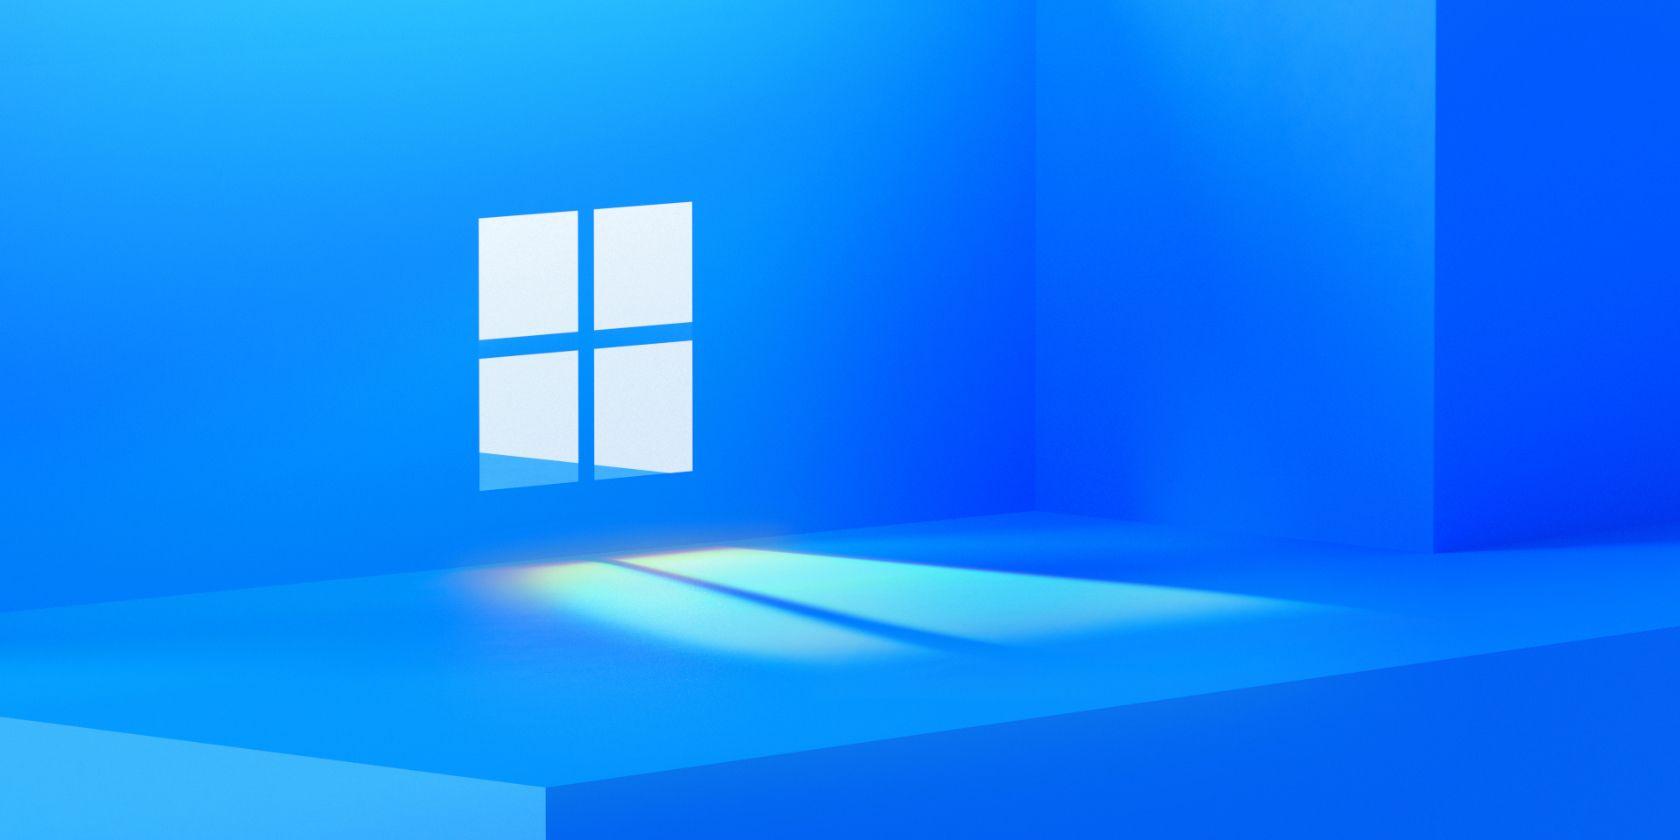 Microsoft Confirms Windows 11